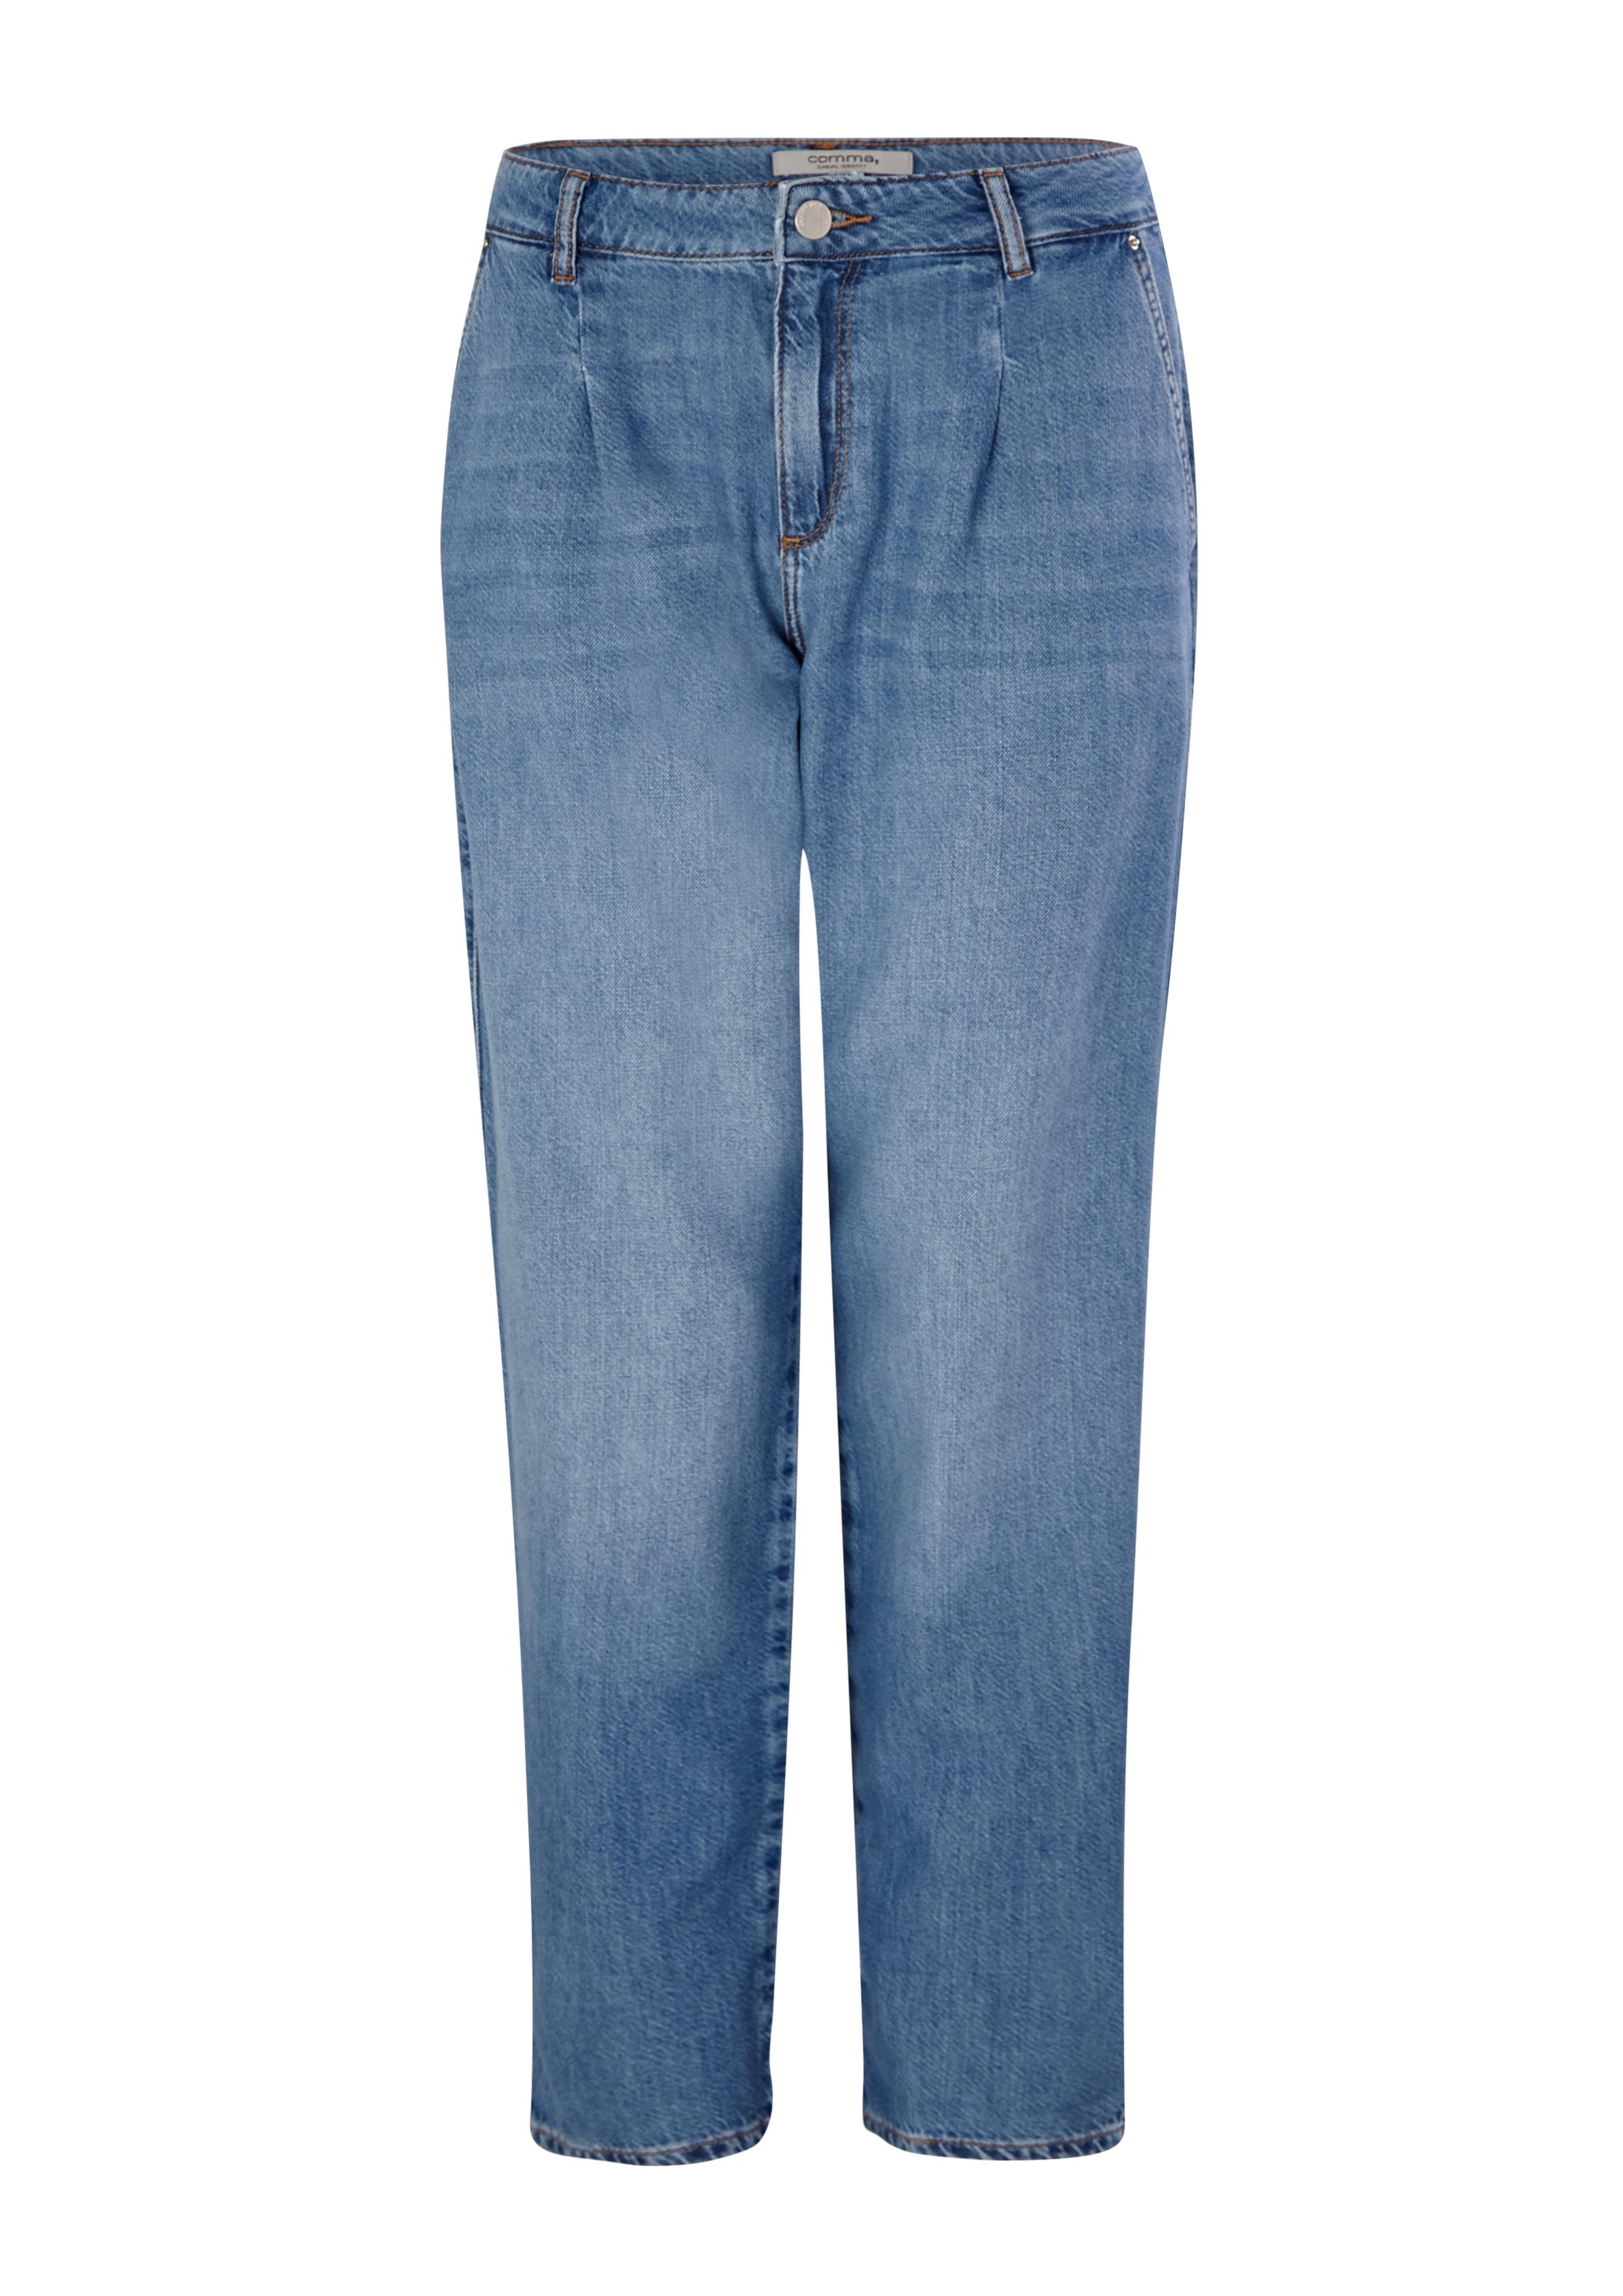 comma ci Jeans mit leichter Waschung